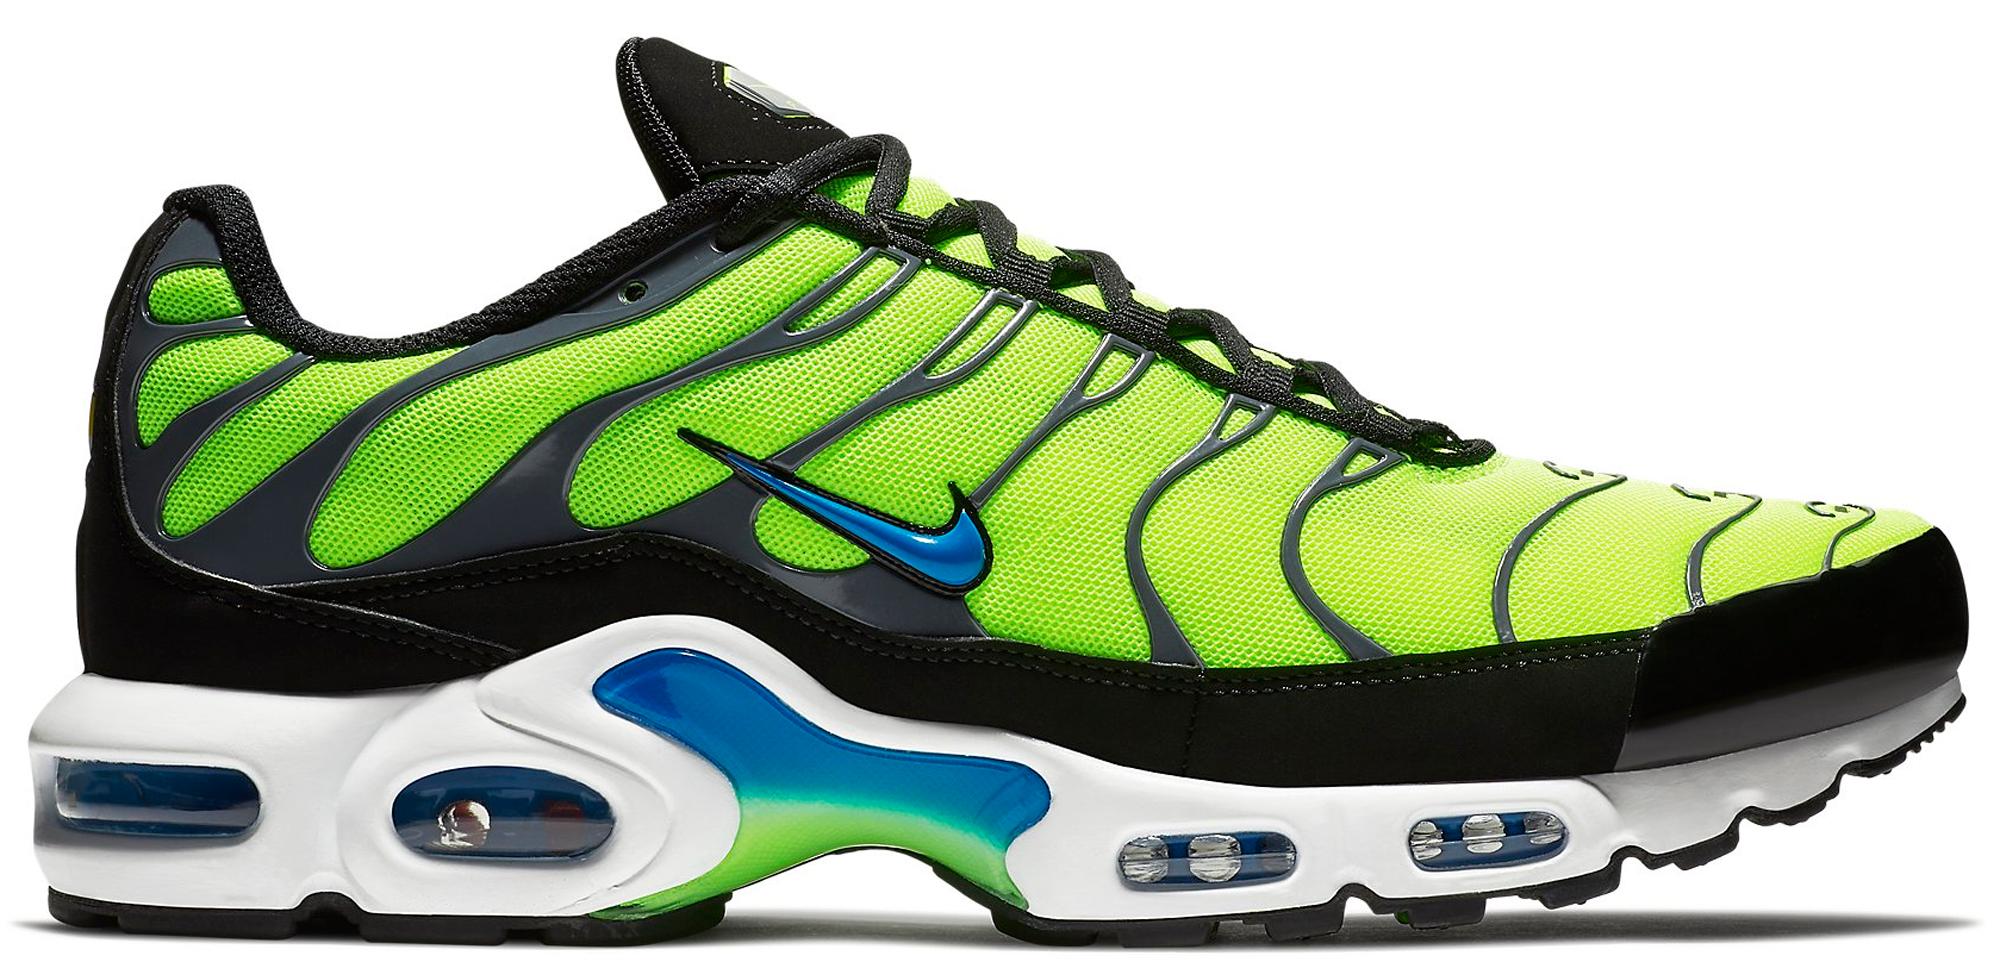 7fed21365b canada nike mens air max plus 2009 sneaker green 312a8 b84f2; buy air max  plus scream green 7eee6 c4b50